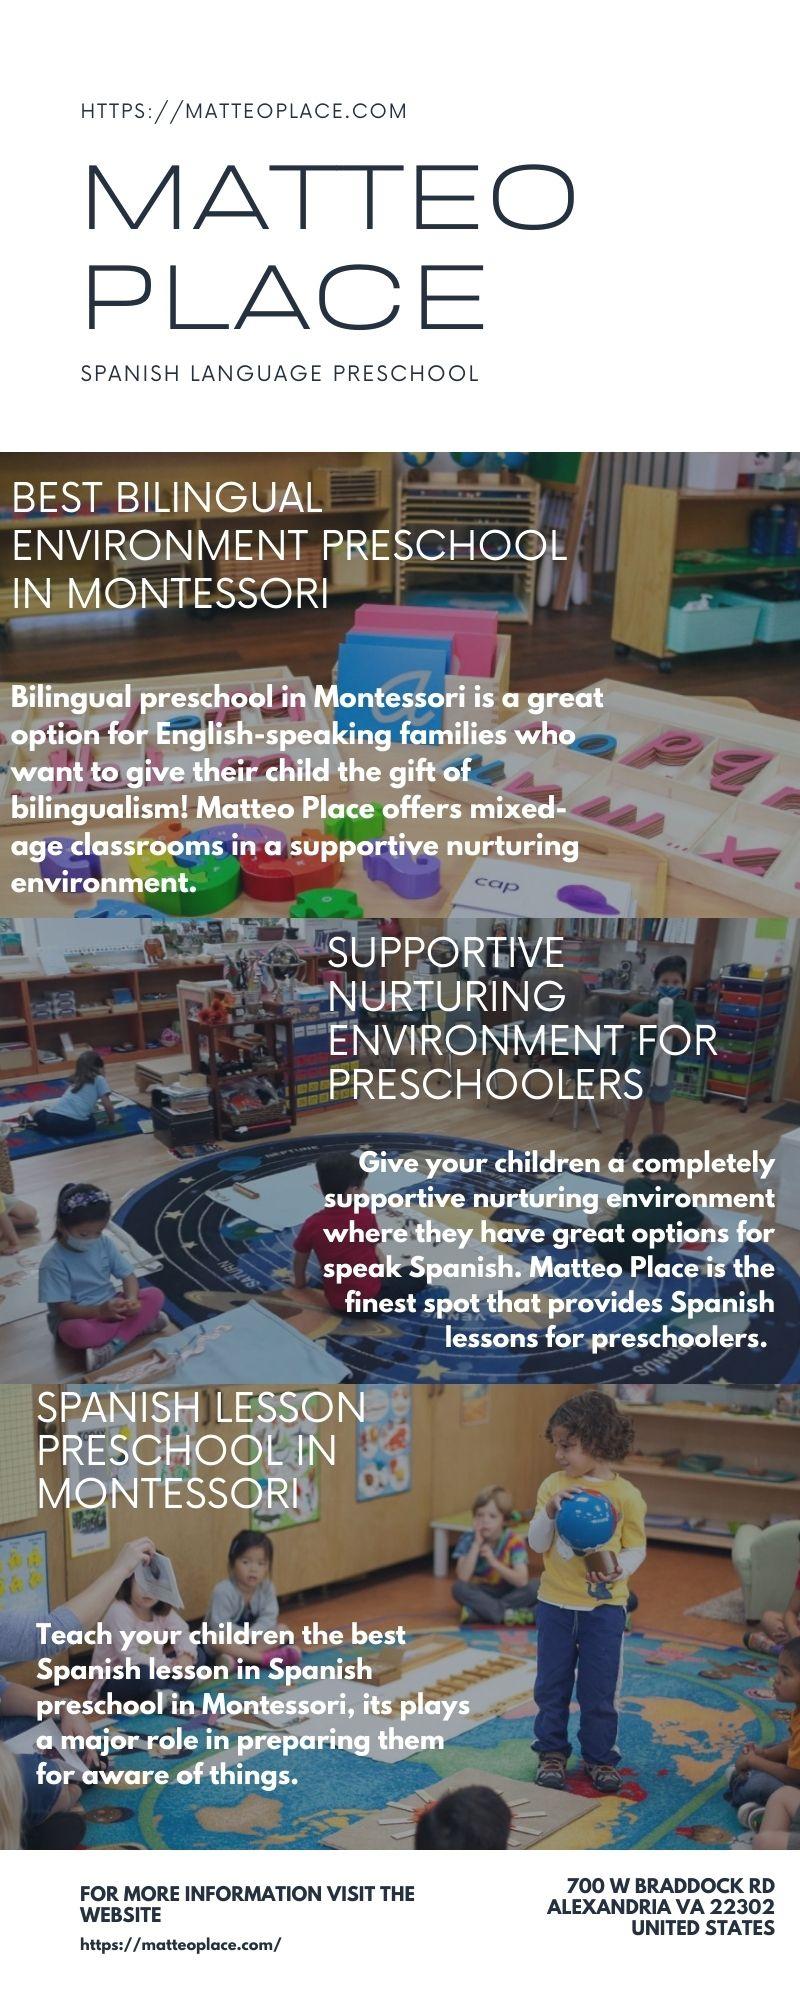 Bilingual education – Best 2nd language education